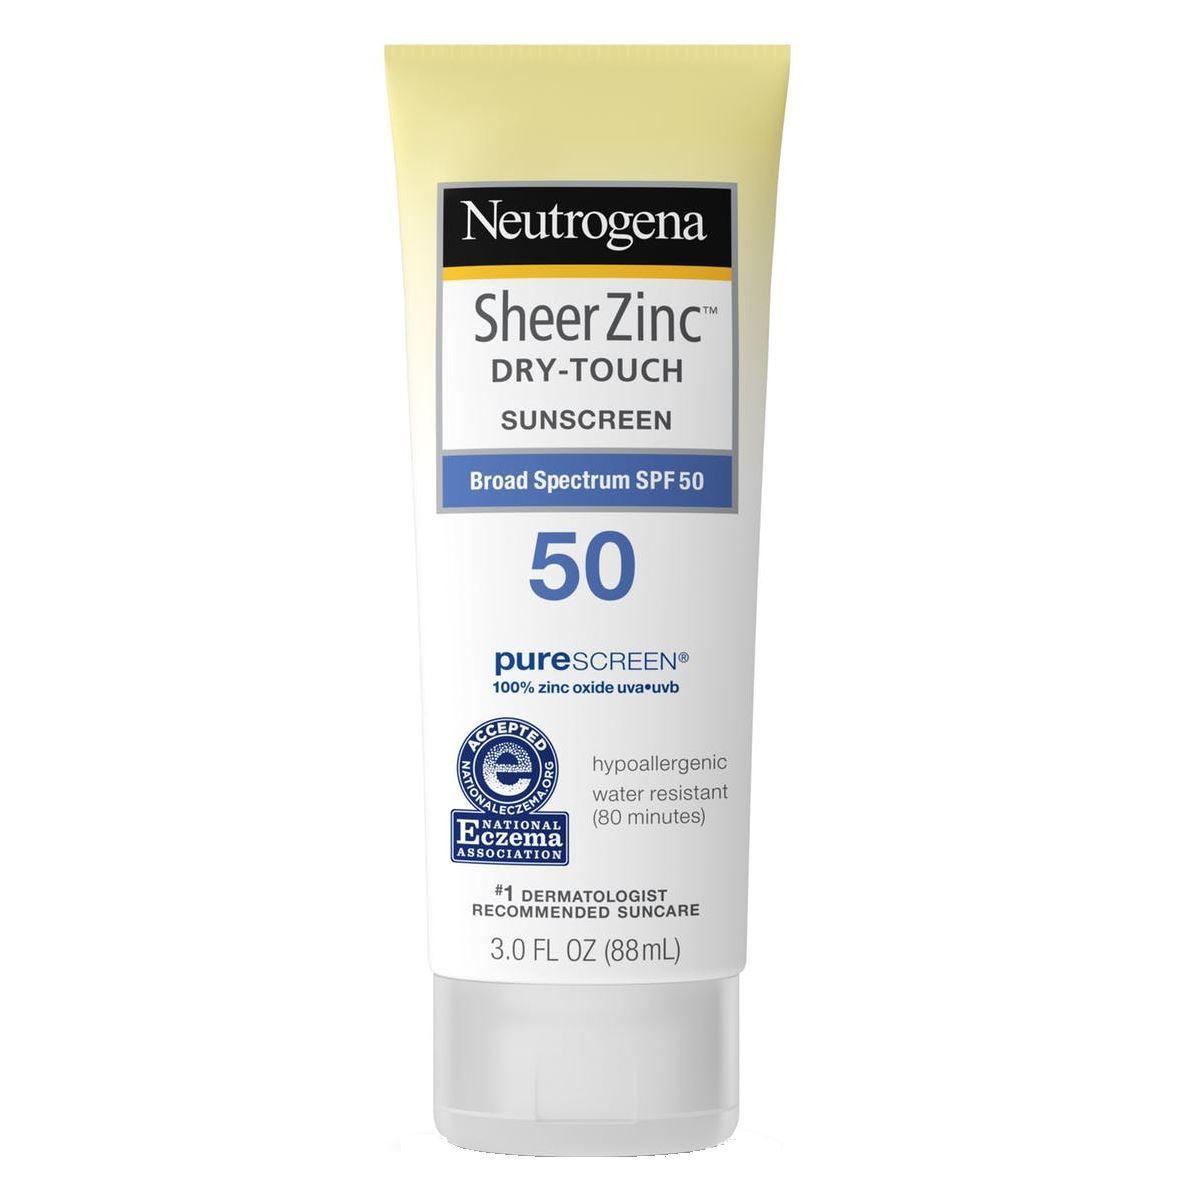 Sheer Zinc Sunscreen Face Lotion SPF 50